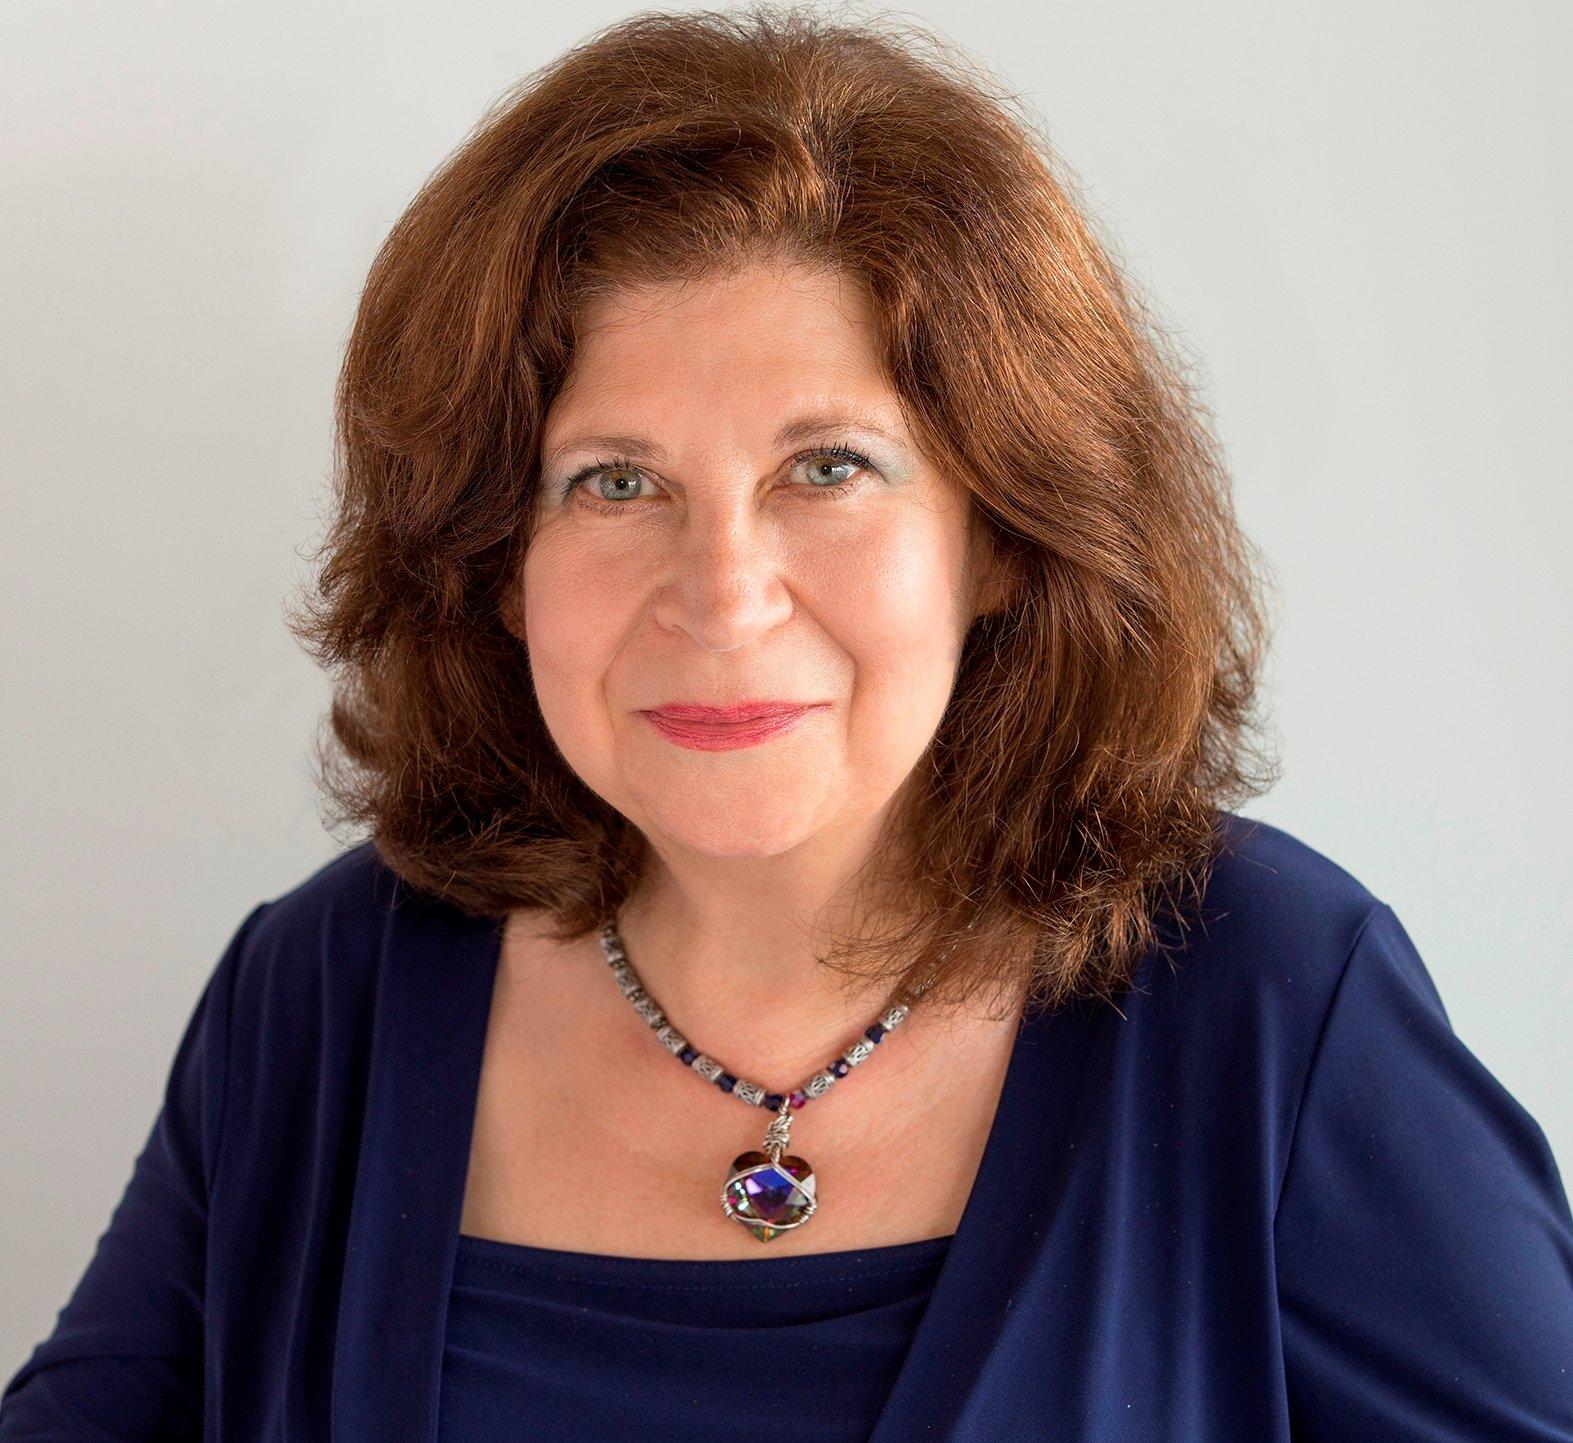 Portrait of Joan Carra in psychic attire